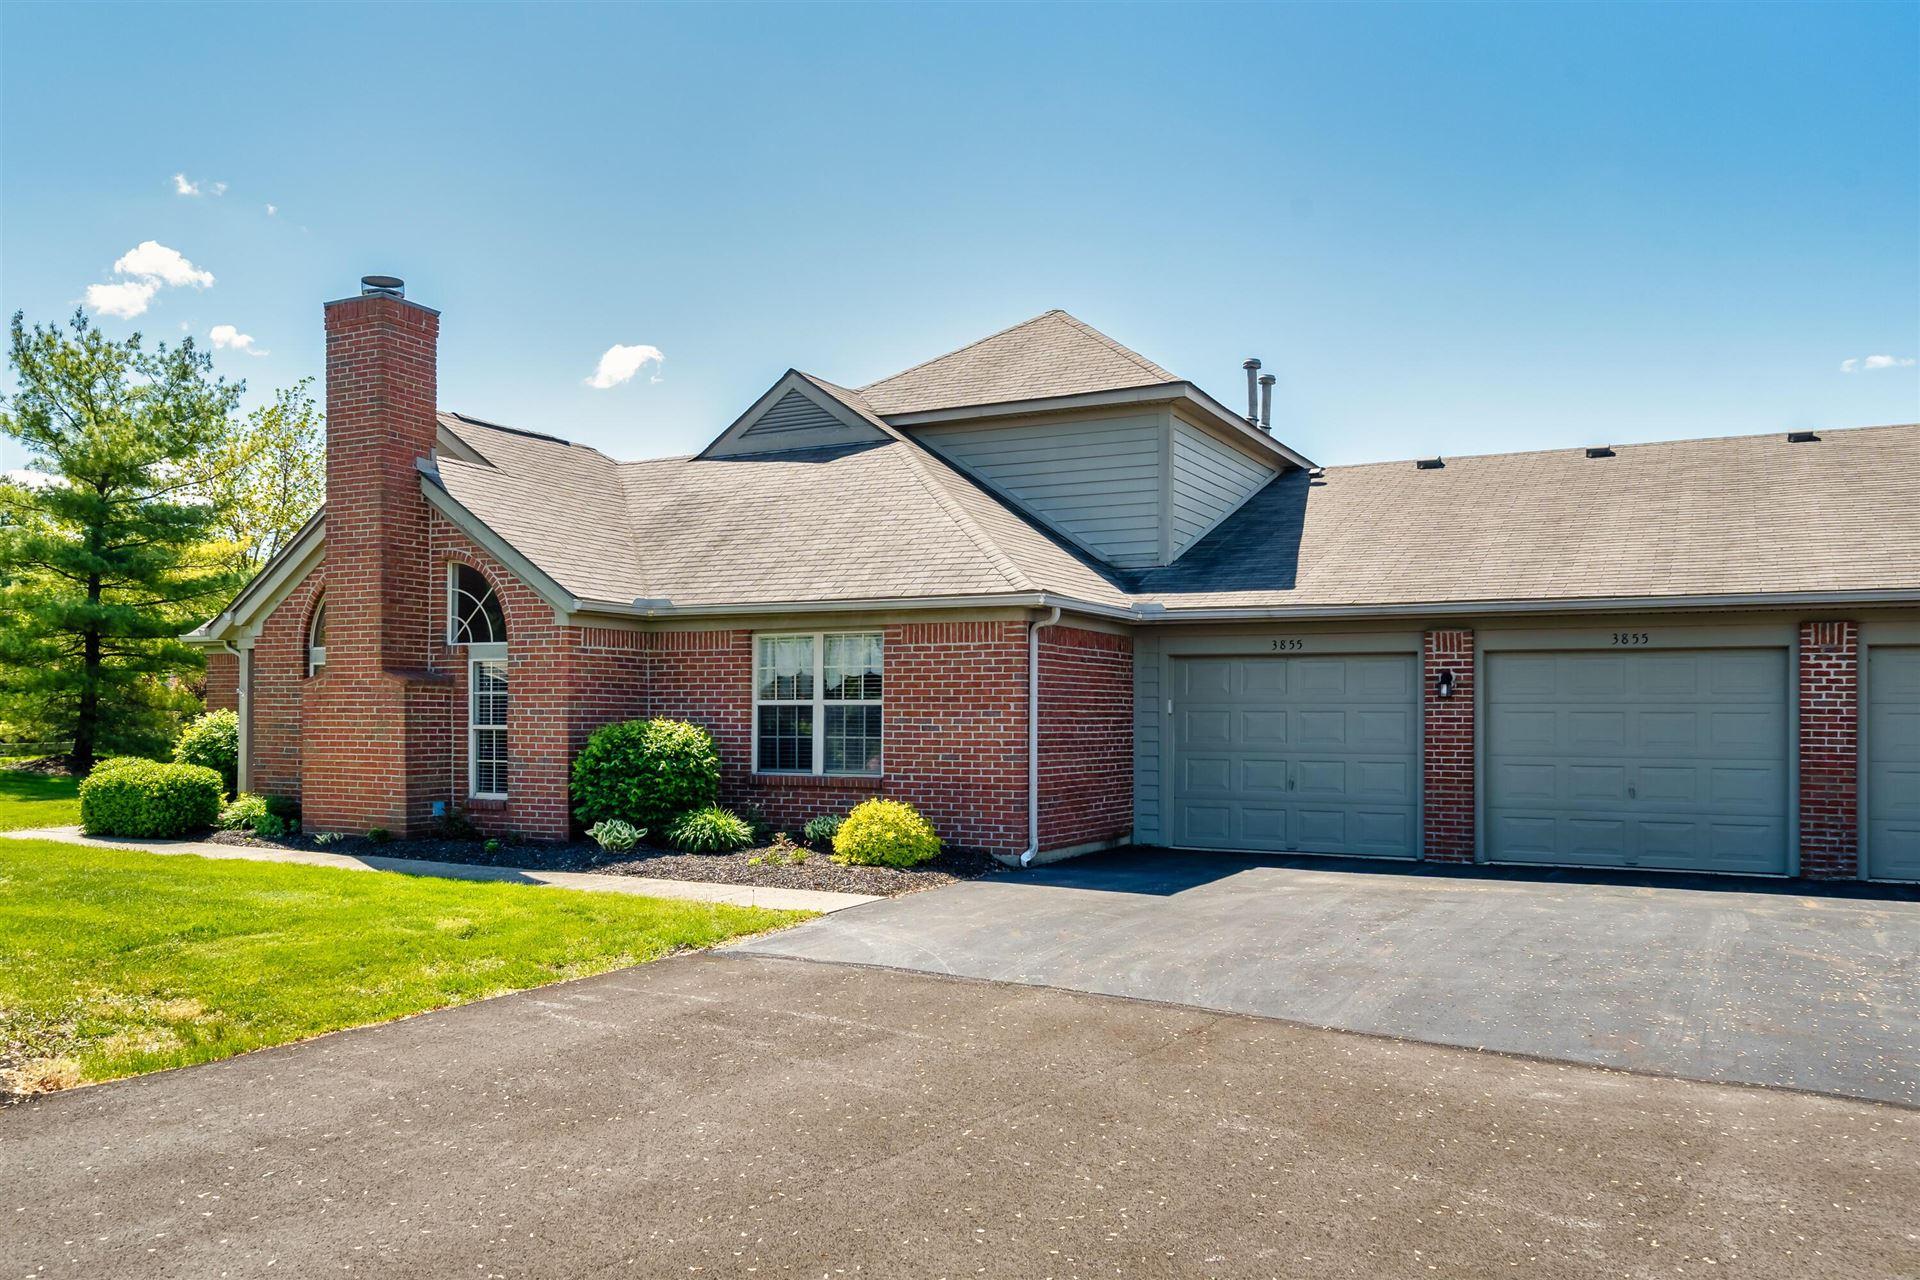 Photo of 3855 Oakbrook Lane, Powell, OH 43065 (MLS # 221015867)